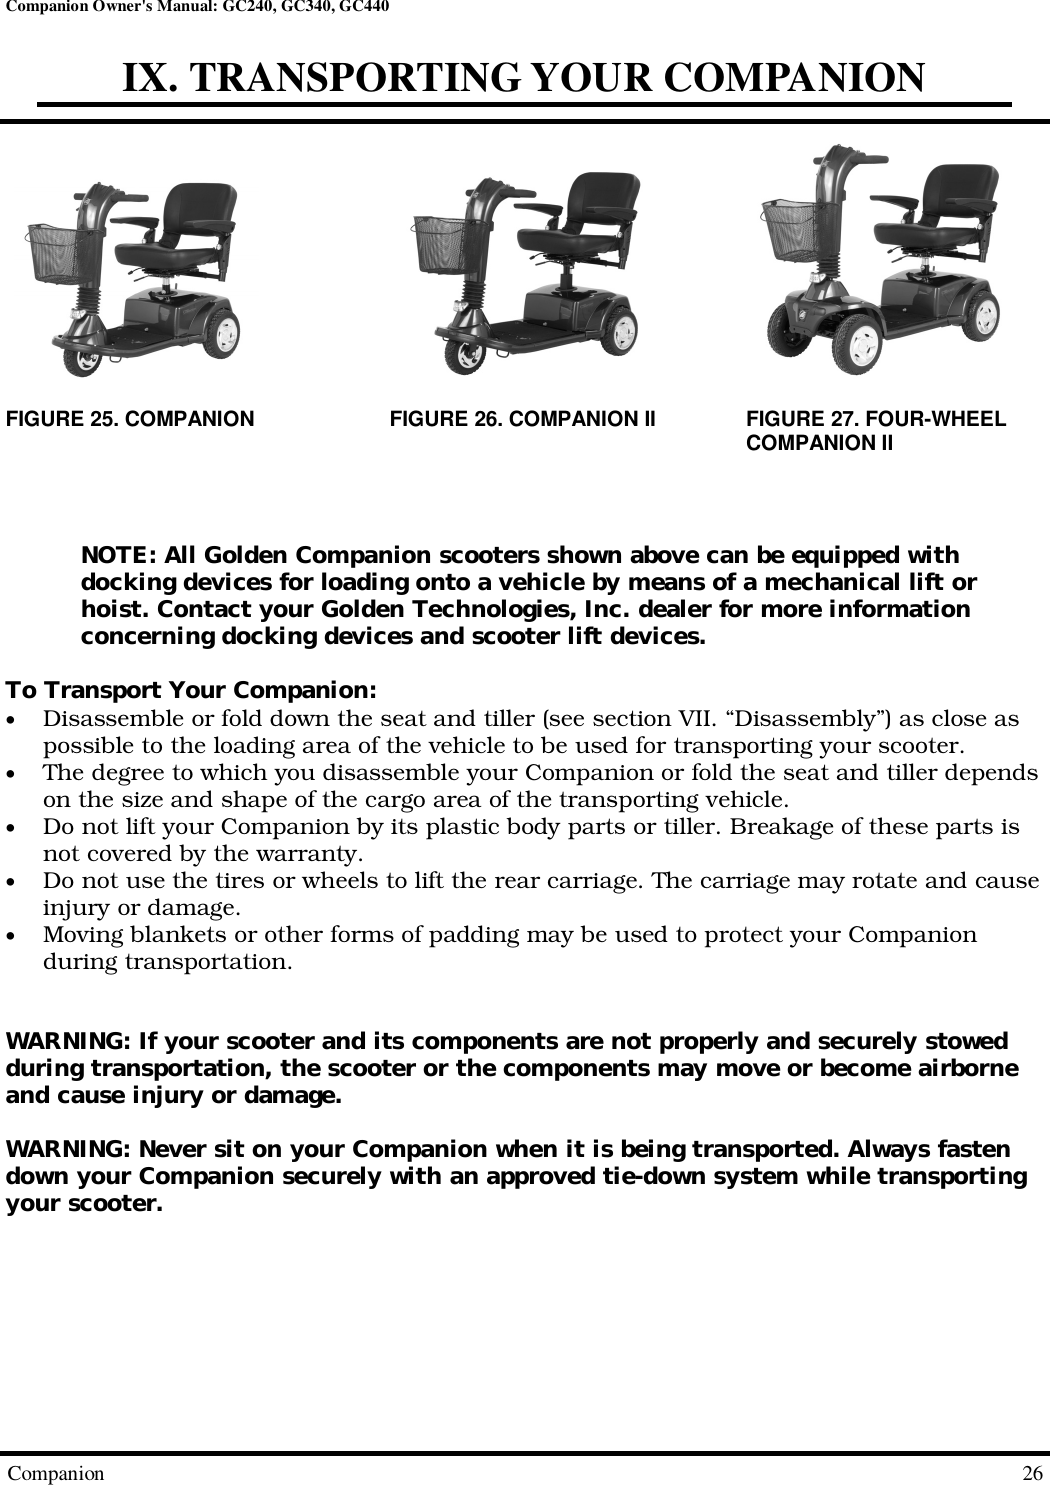 Golden Technologies Gc240 Users Manual CompanionOwnersManual 081409